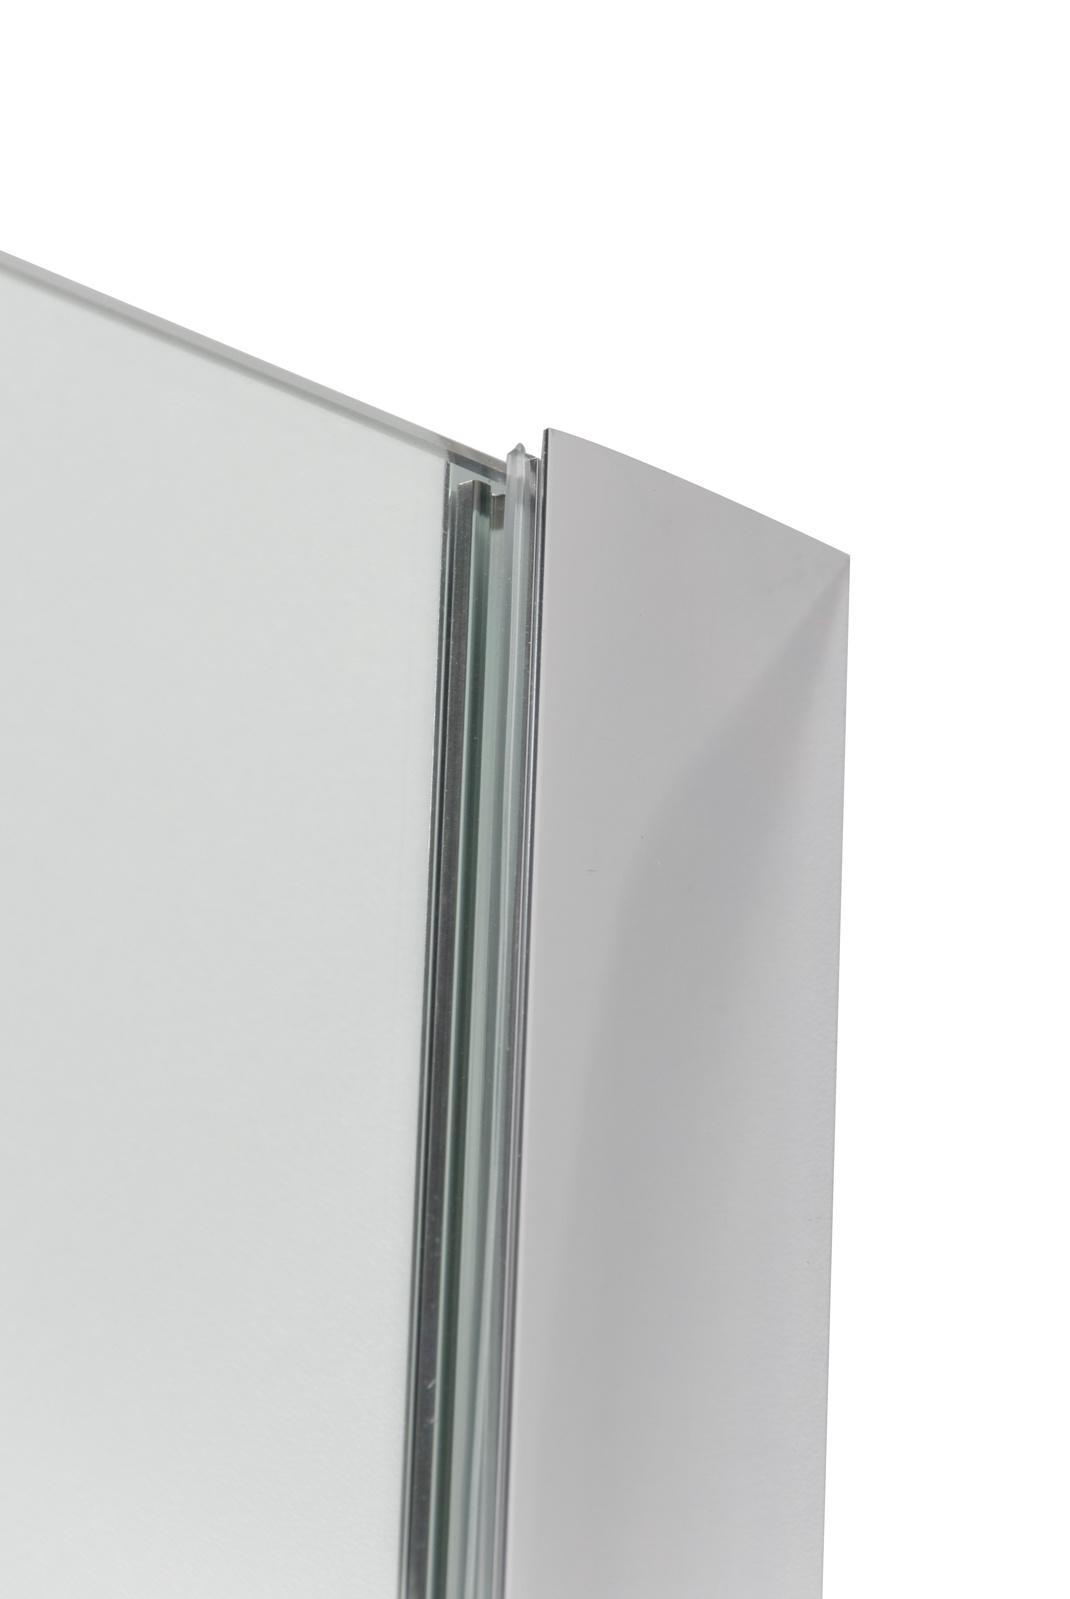 Linea Uno Inloopdouche Göteborg 80 x 200 cm